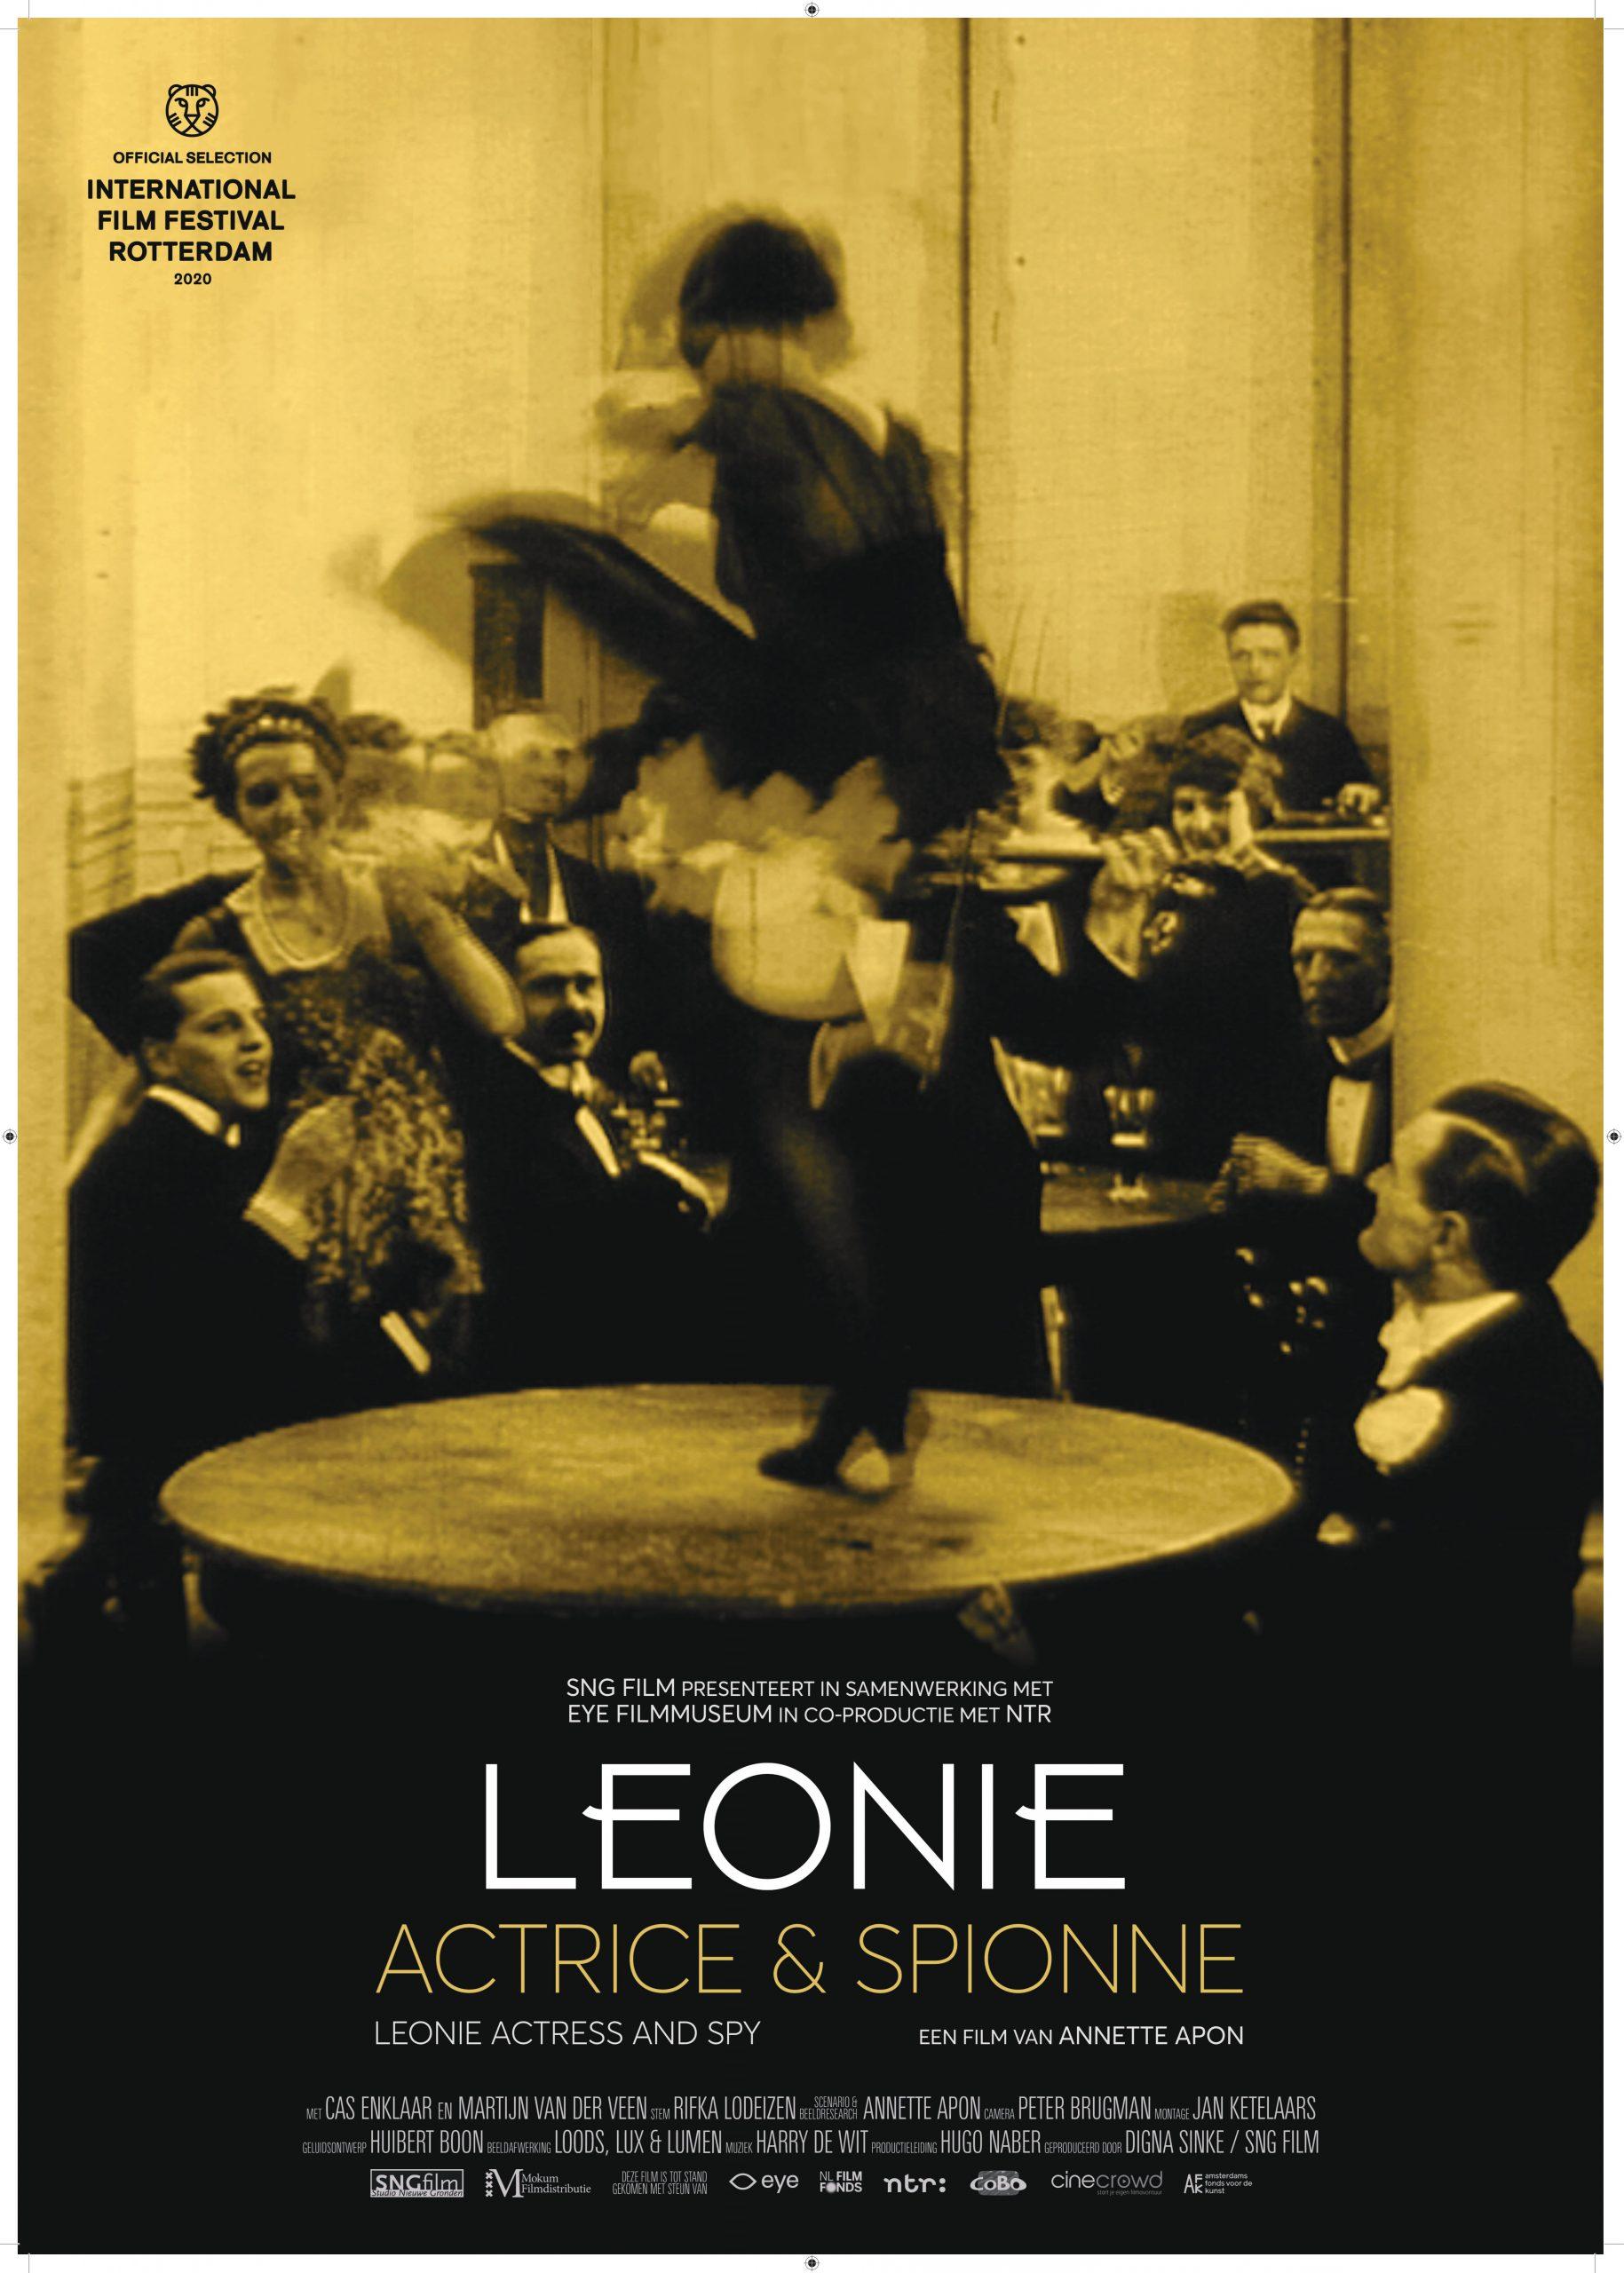 Leonie actrice en spionne